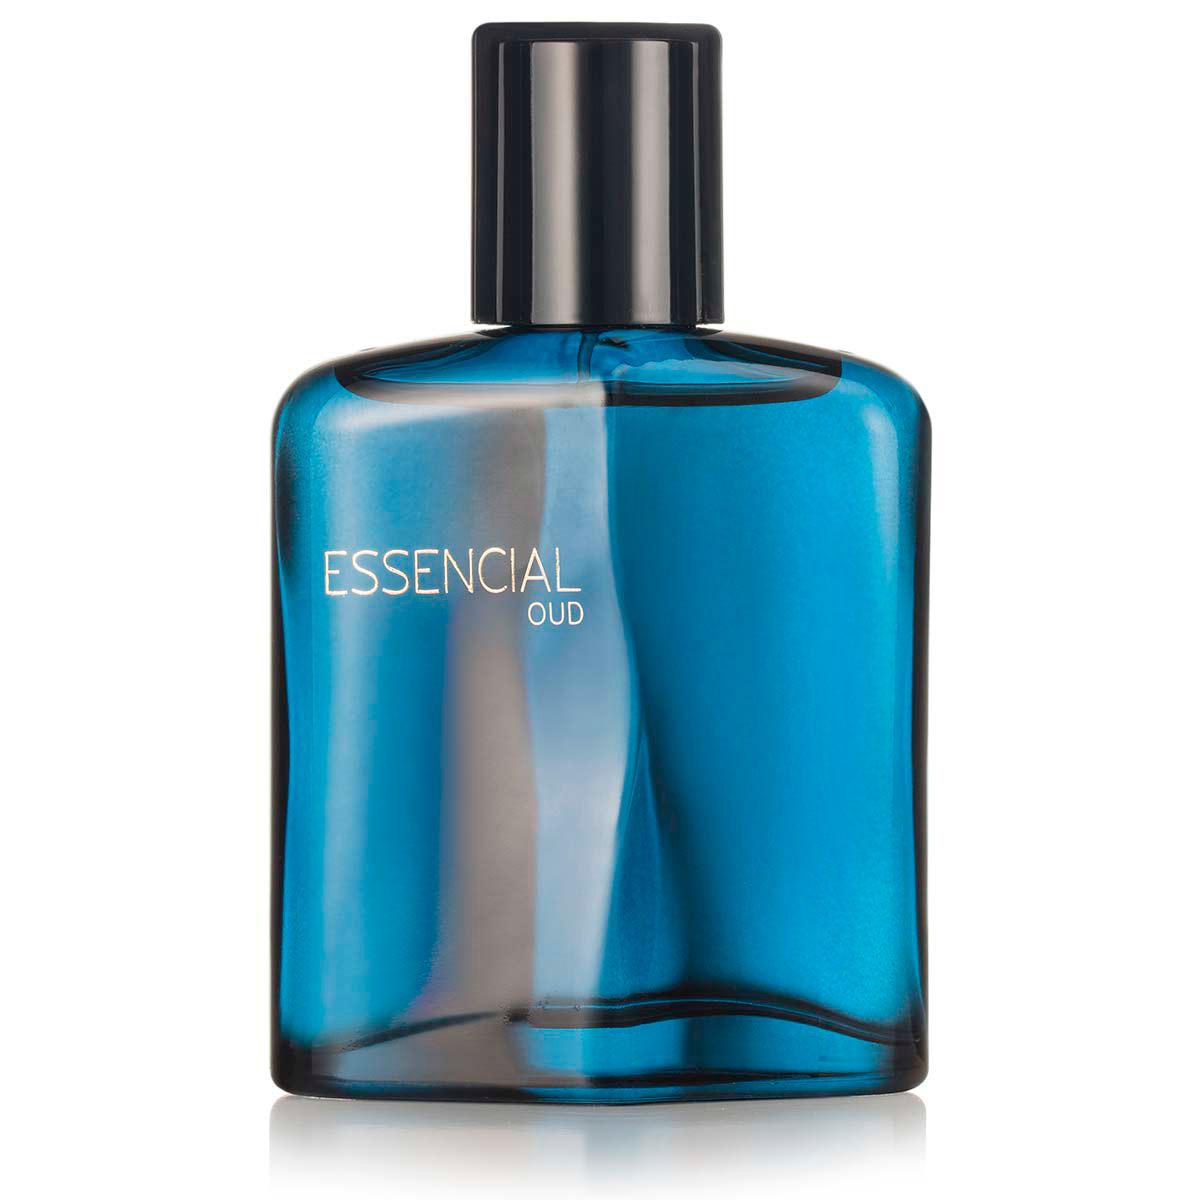 Deo Parfum Essencial Oud Masculino - 100ml - 85143